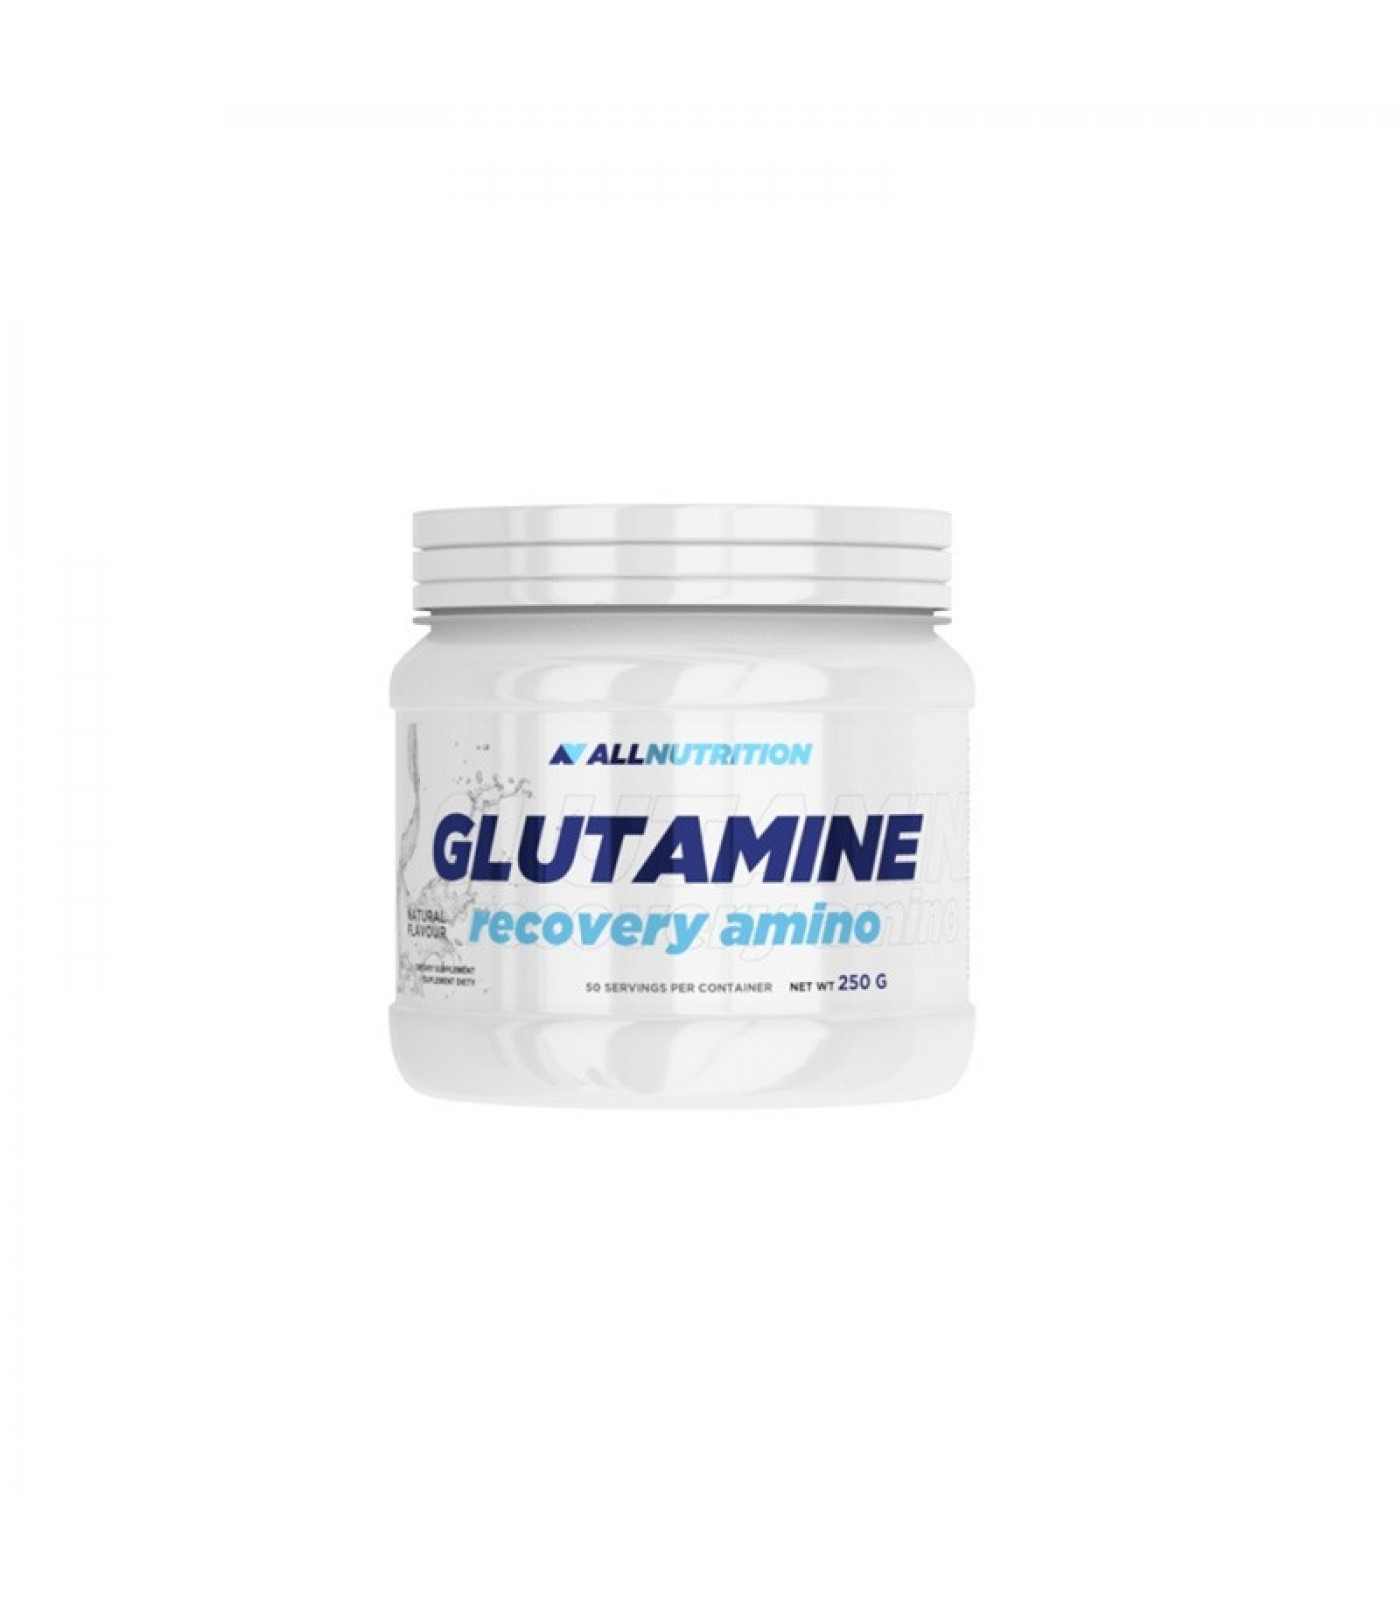 Allnutrition Glutamine Recovery Amino 250g